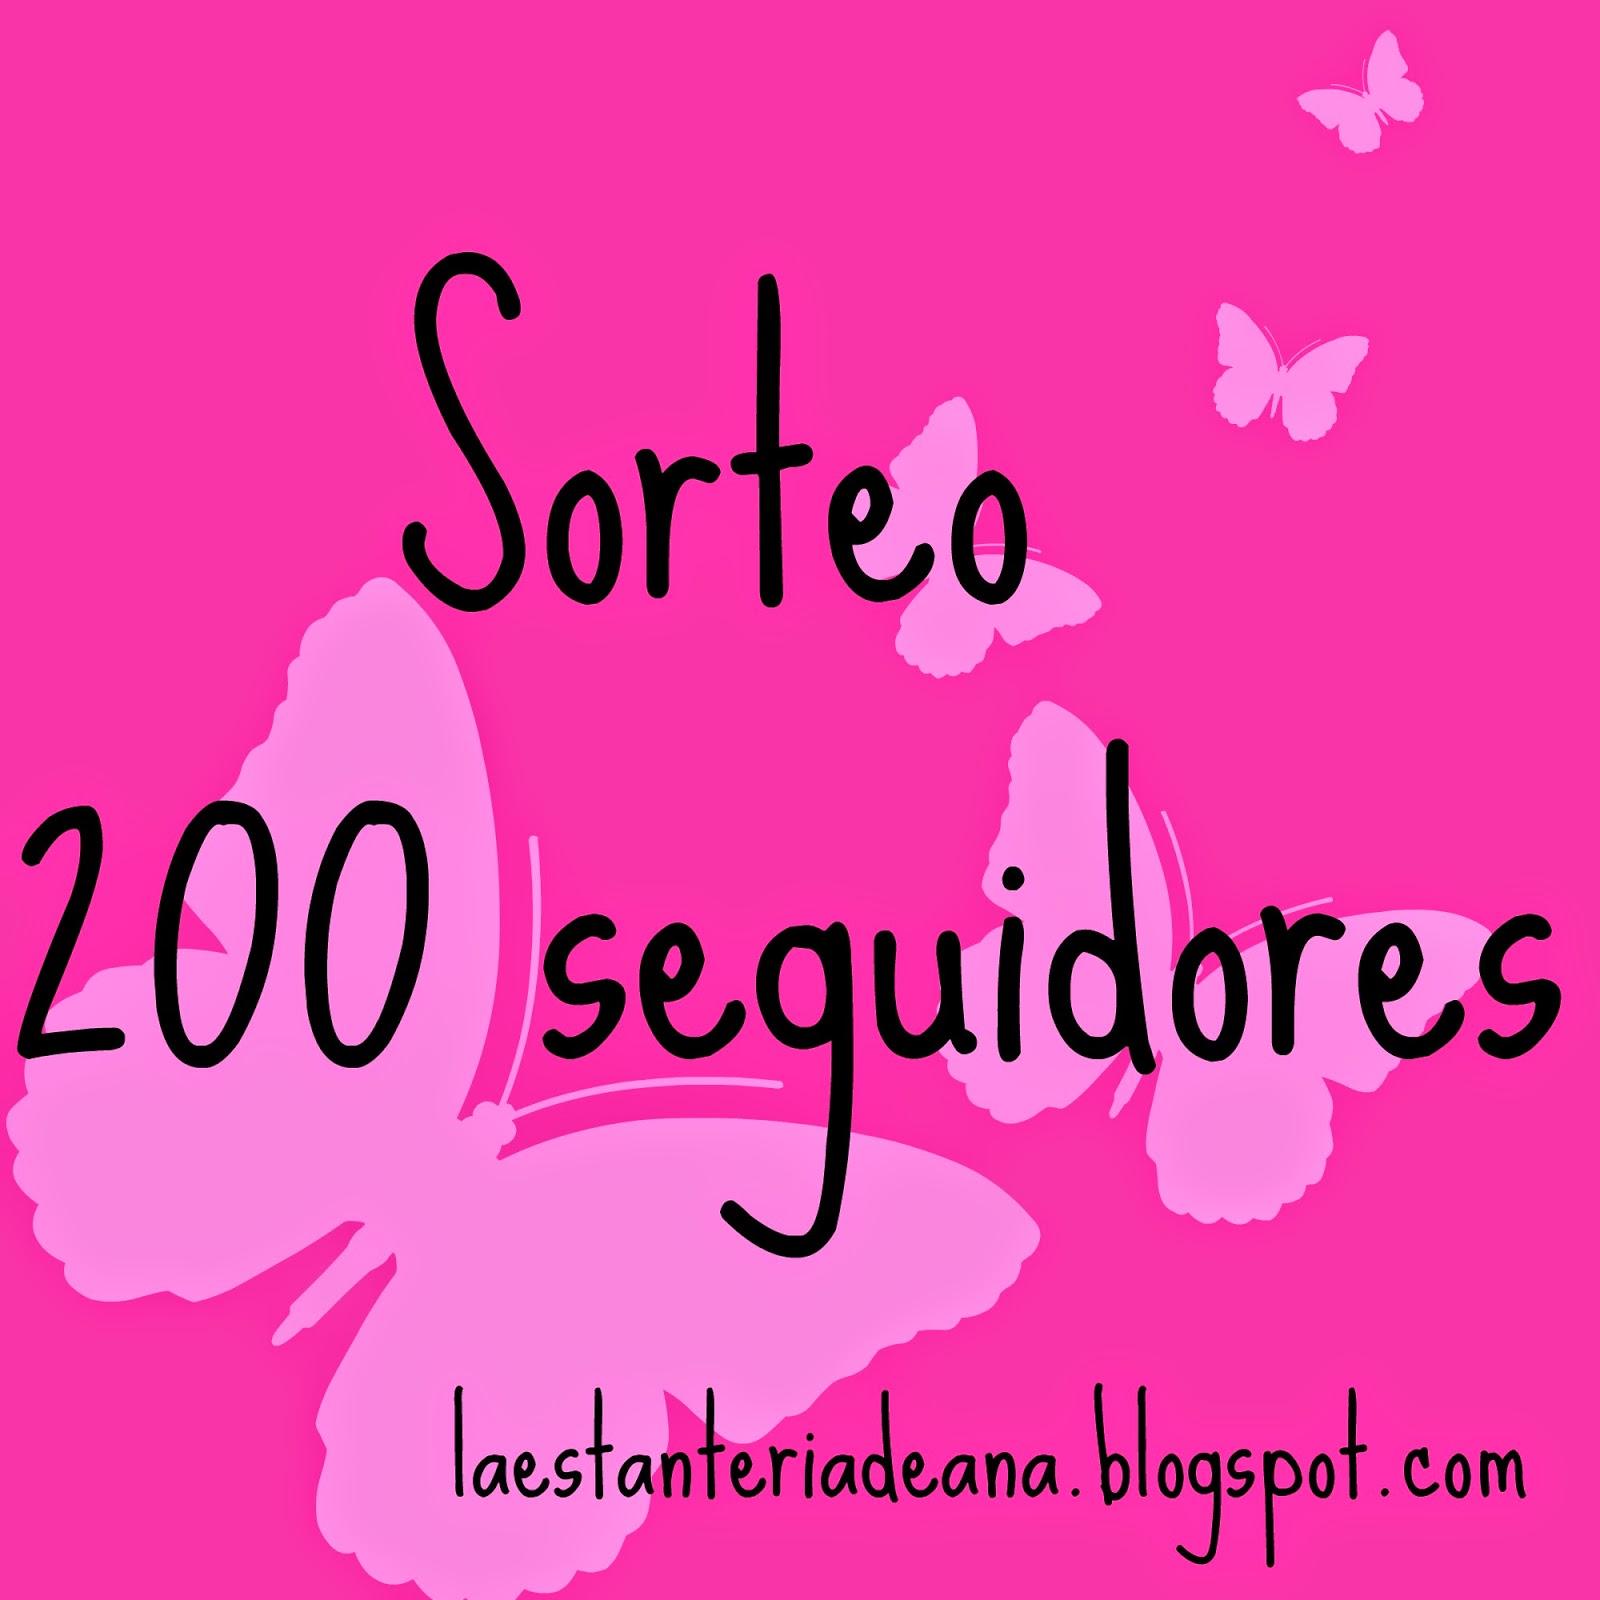 http://laestanteriadeana.blogspot.com.es/2014/10/sorteo-200-seguidores.html?showComment=1413322033707#c2049422024368480352